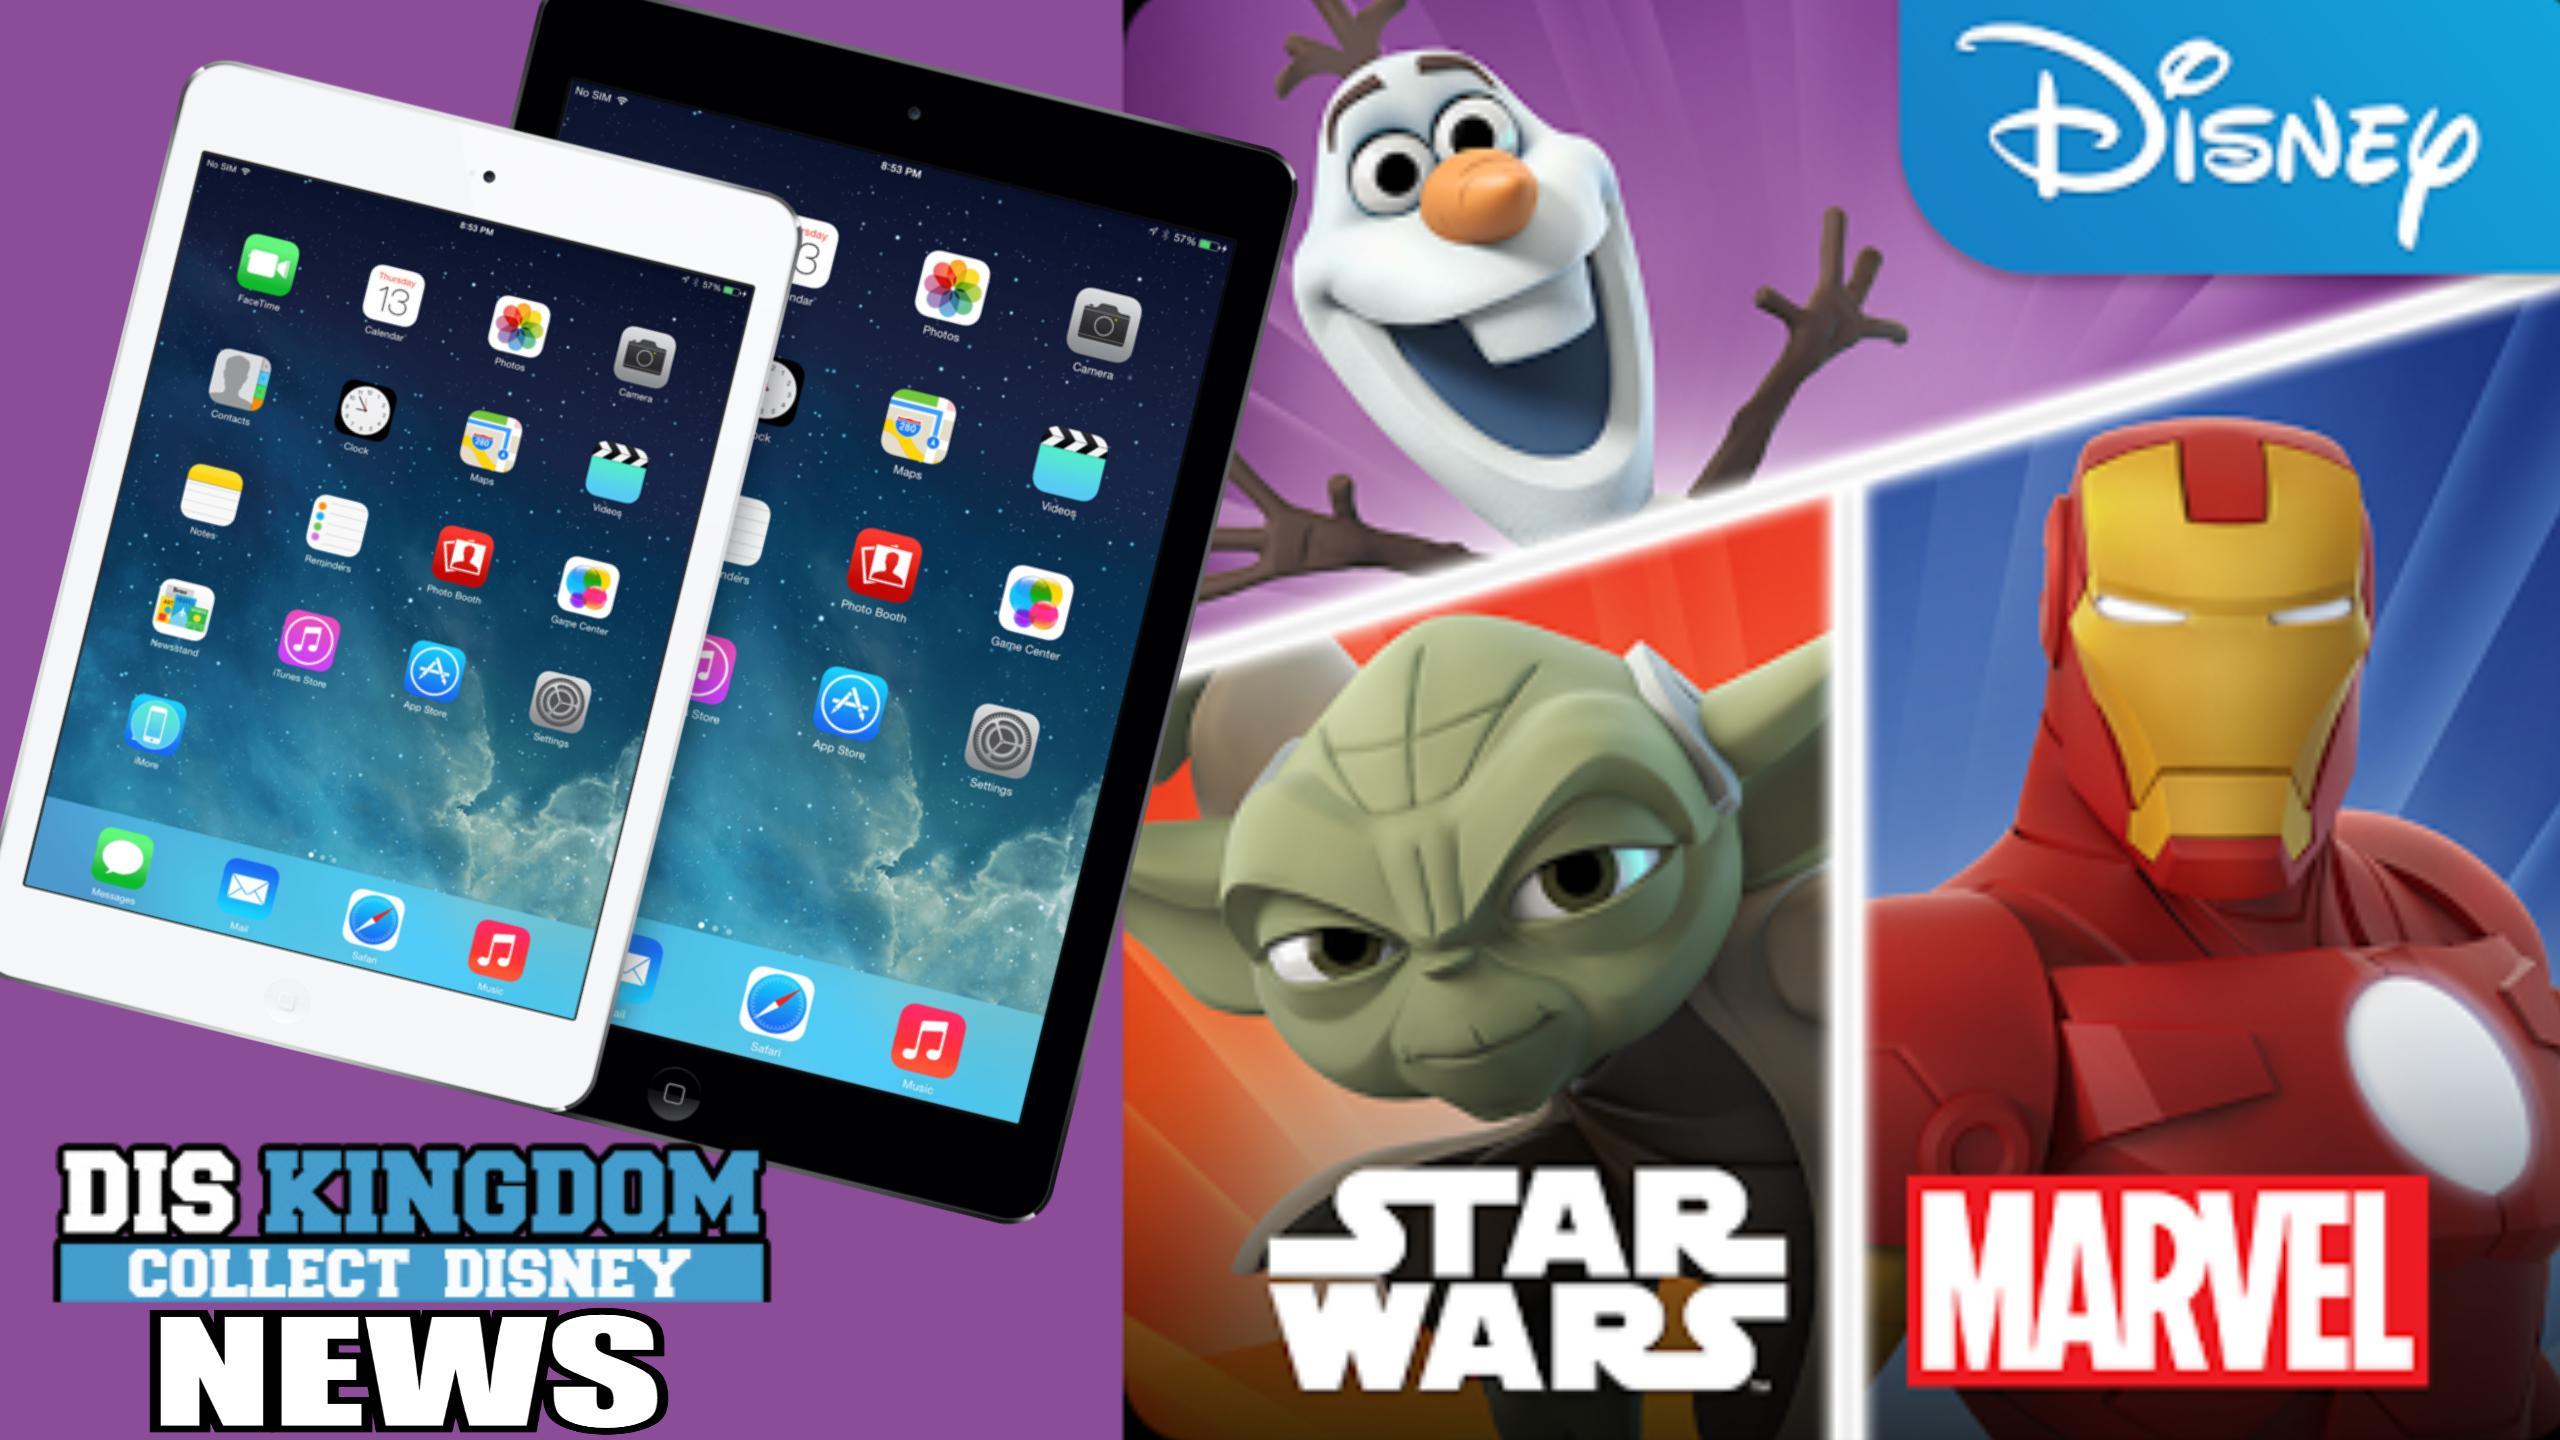 Disney Infinity 3.0 Comes To Mobile